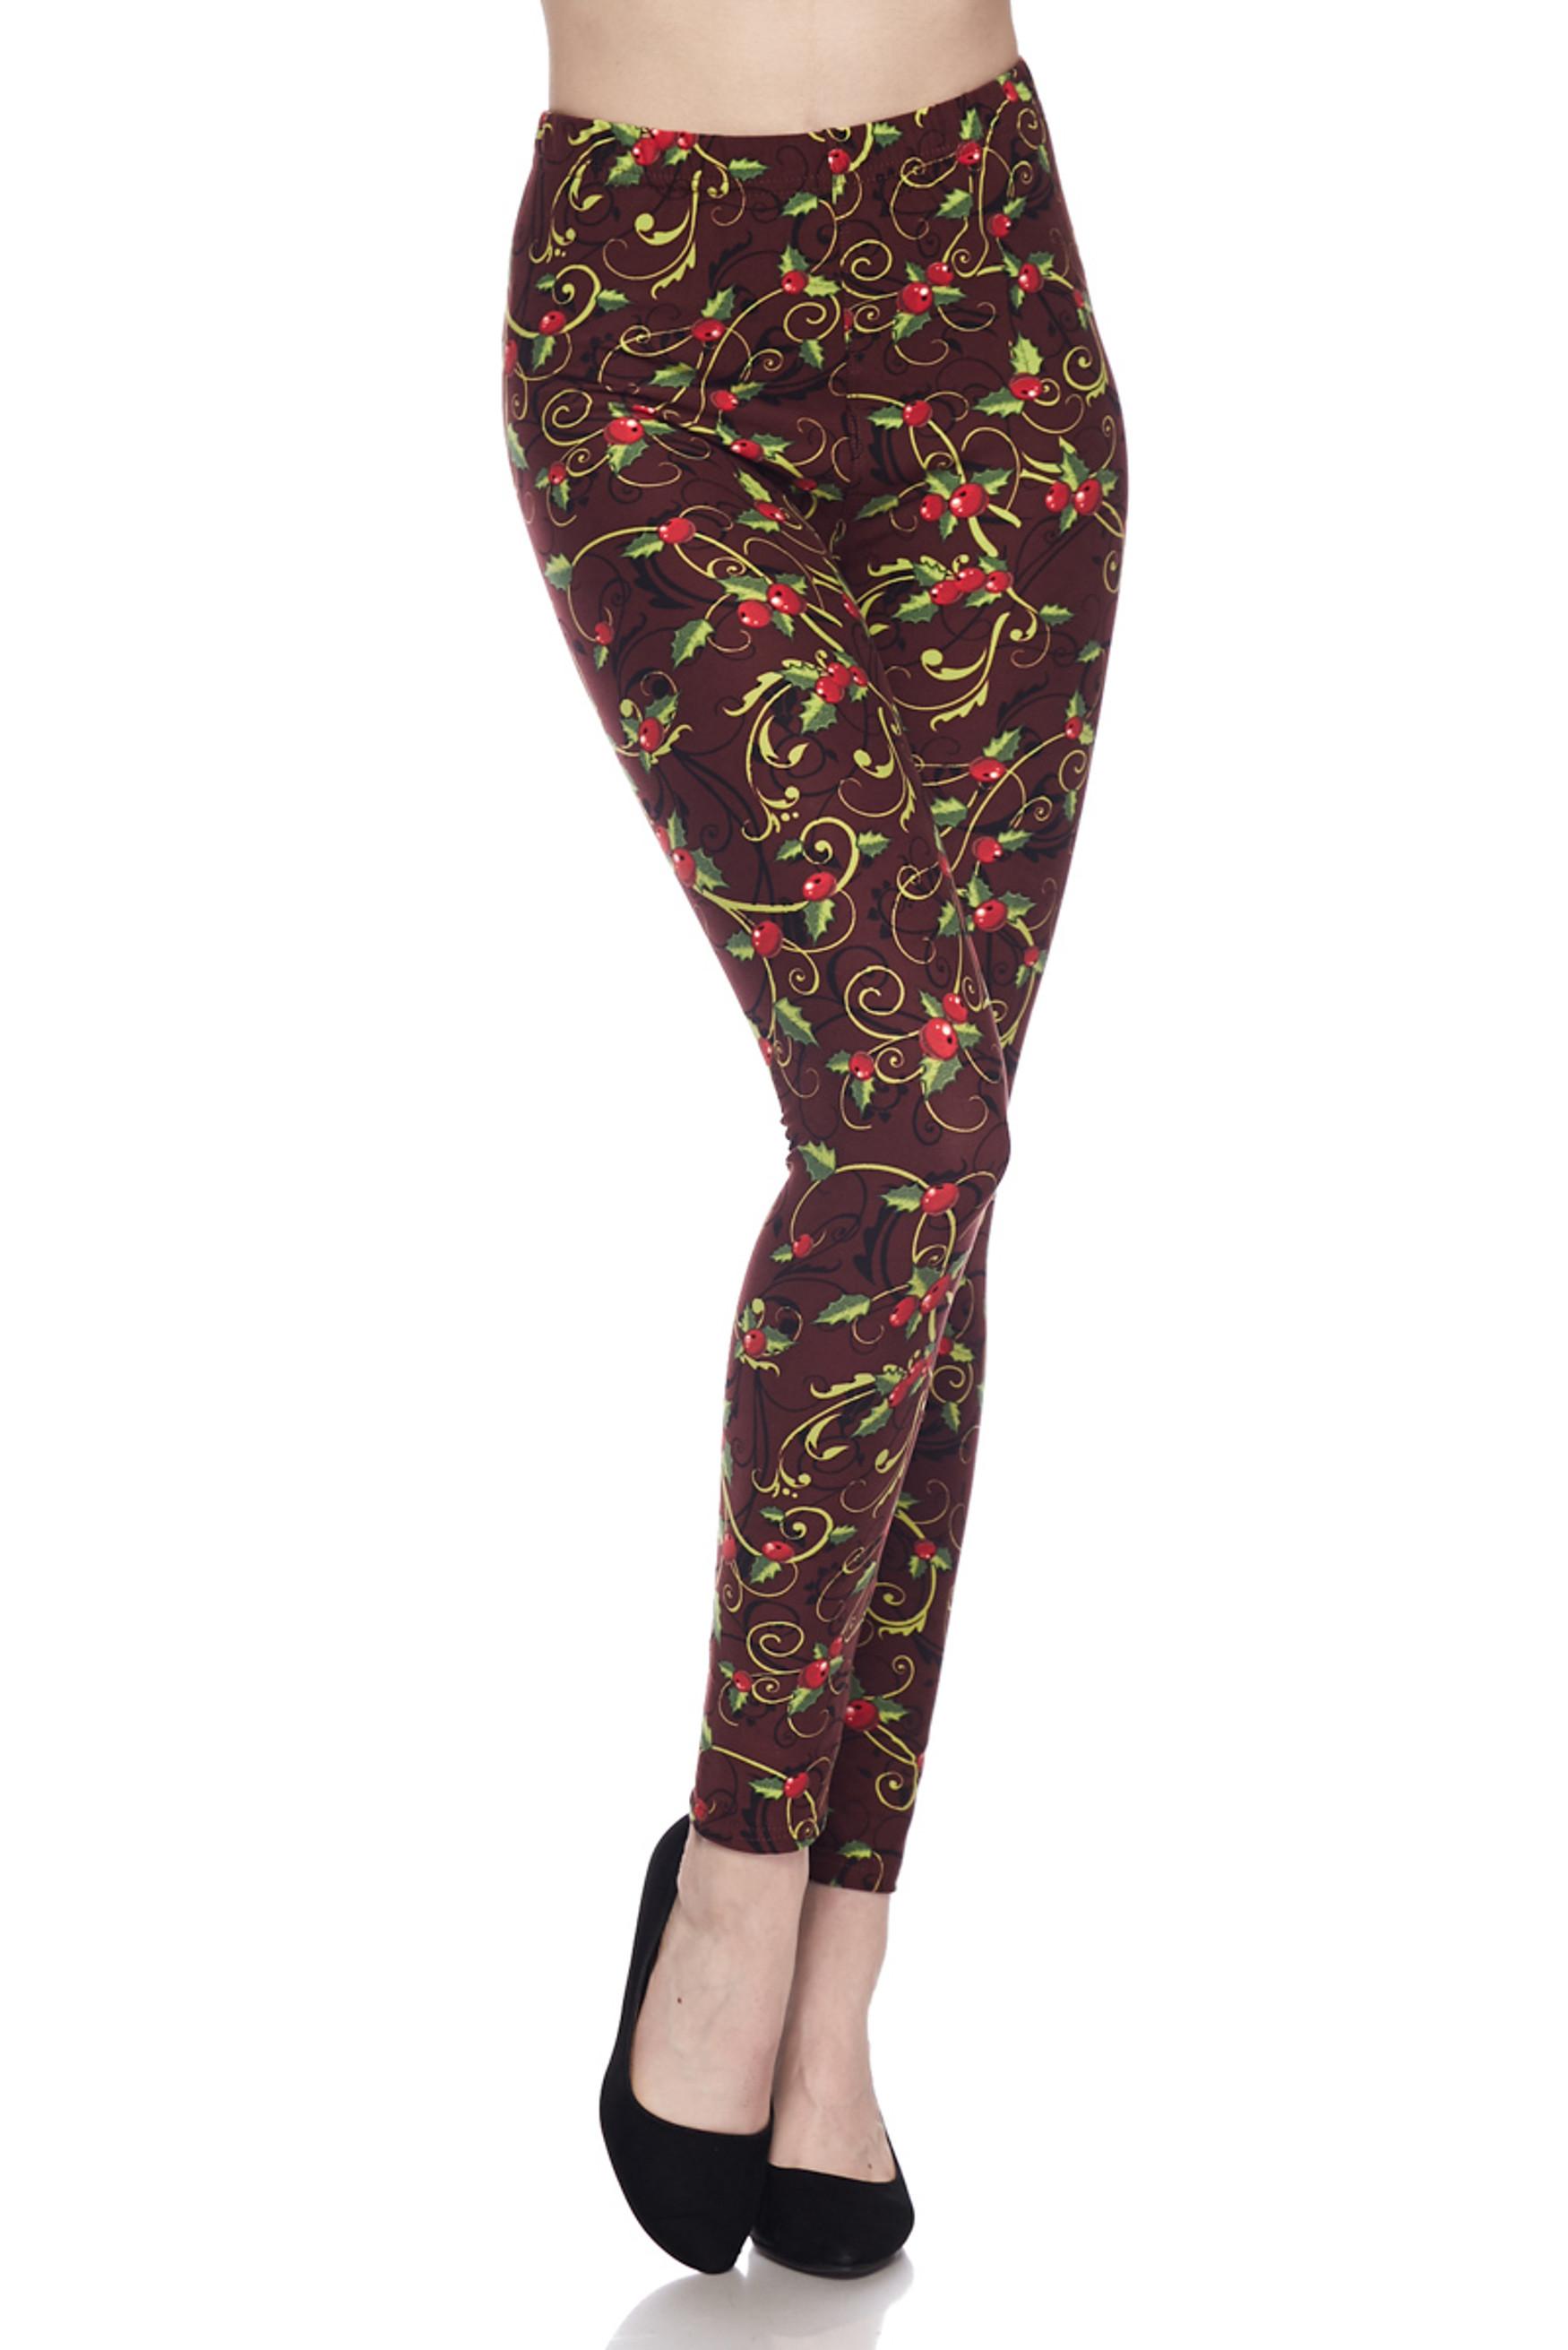 Brushed Christmas Holly Plus Size Leggings - 3X-5X